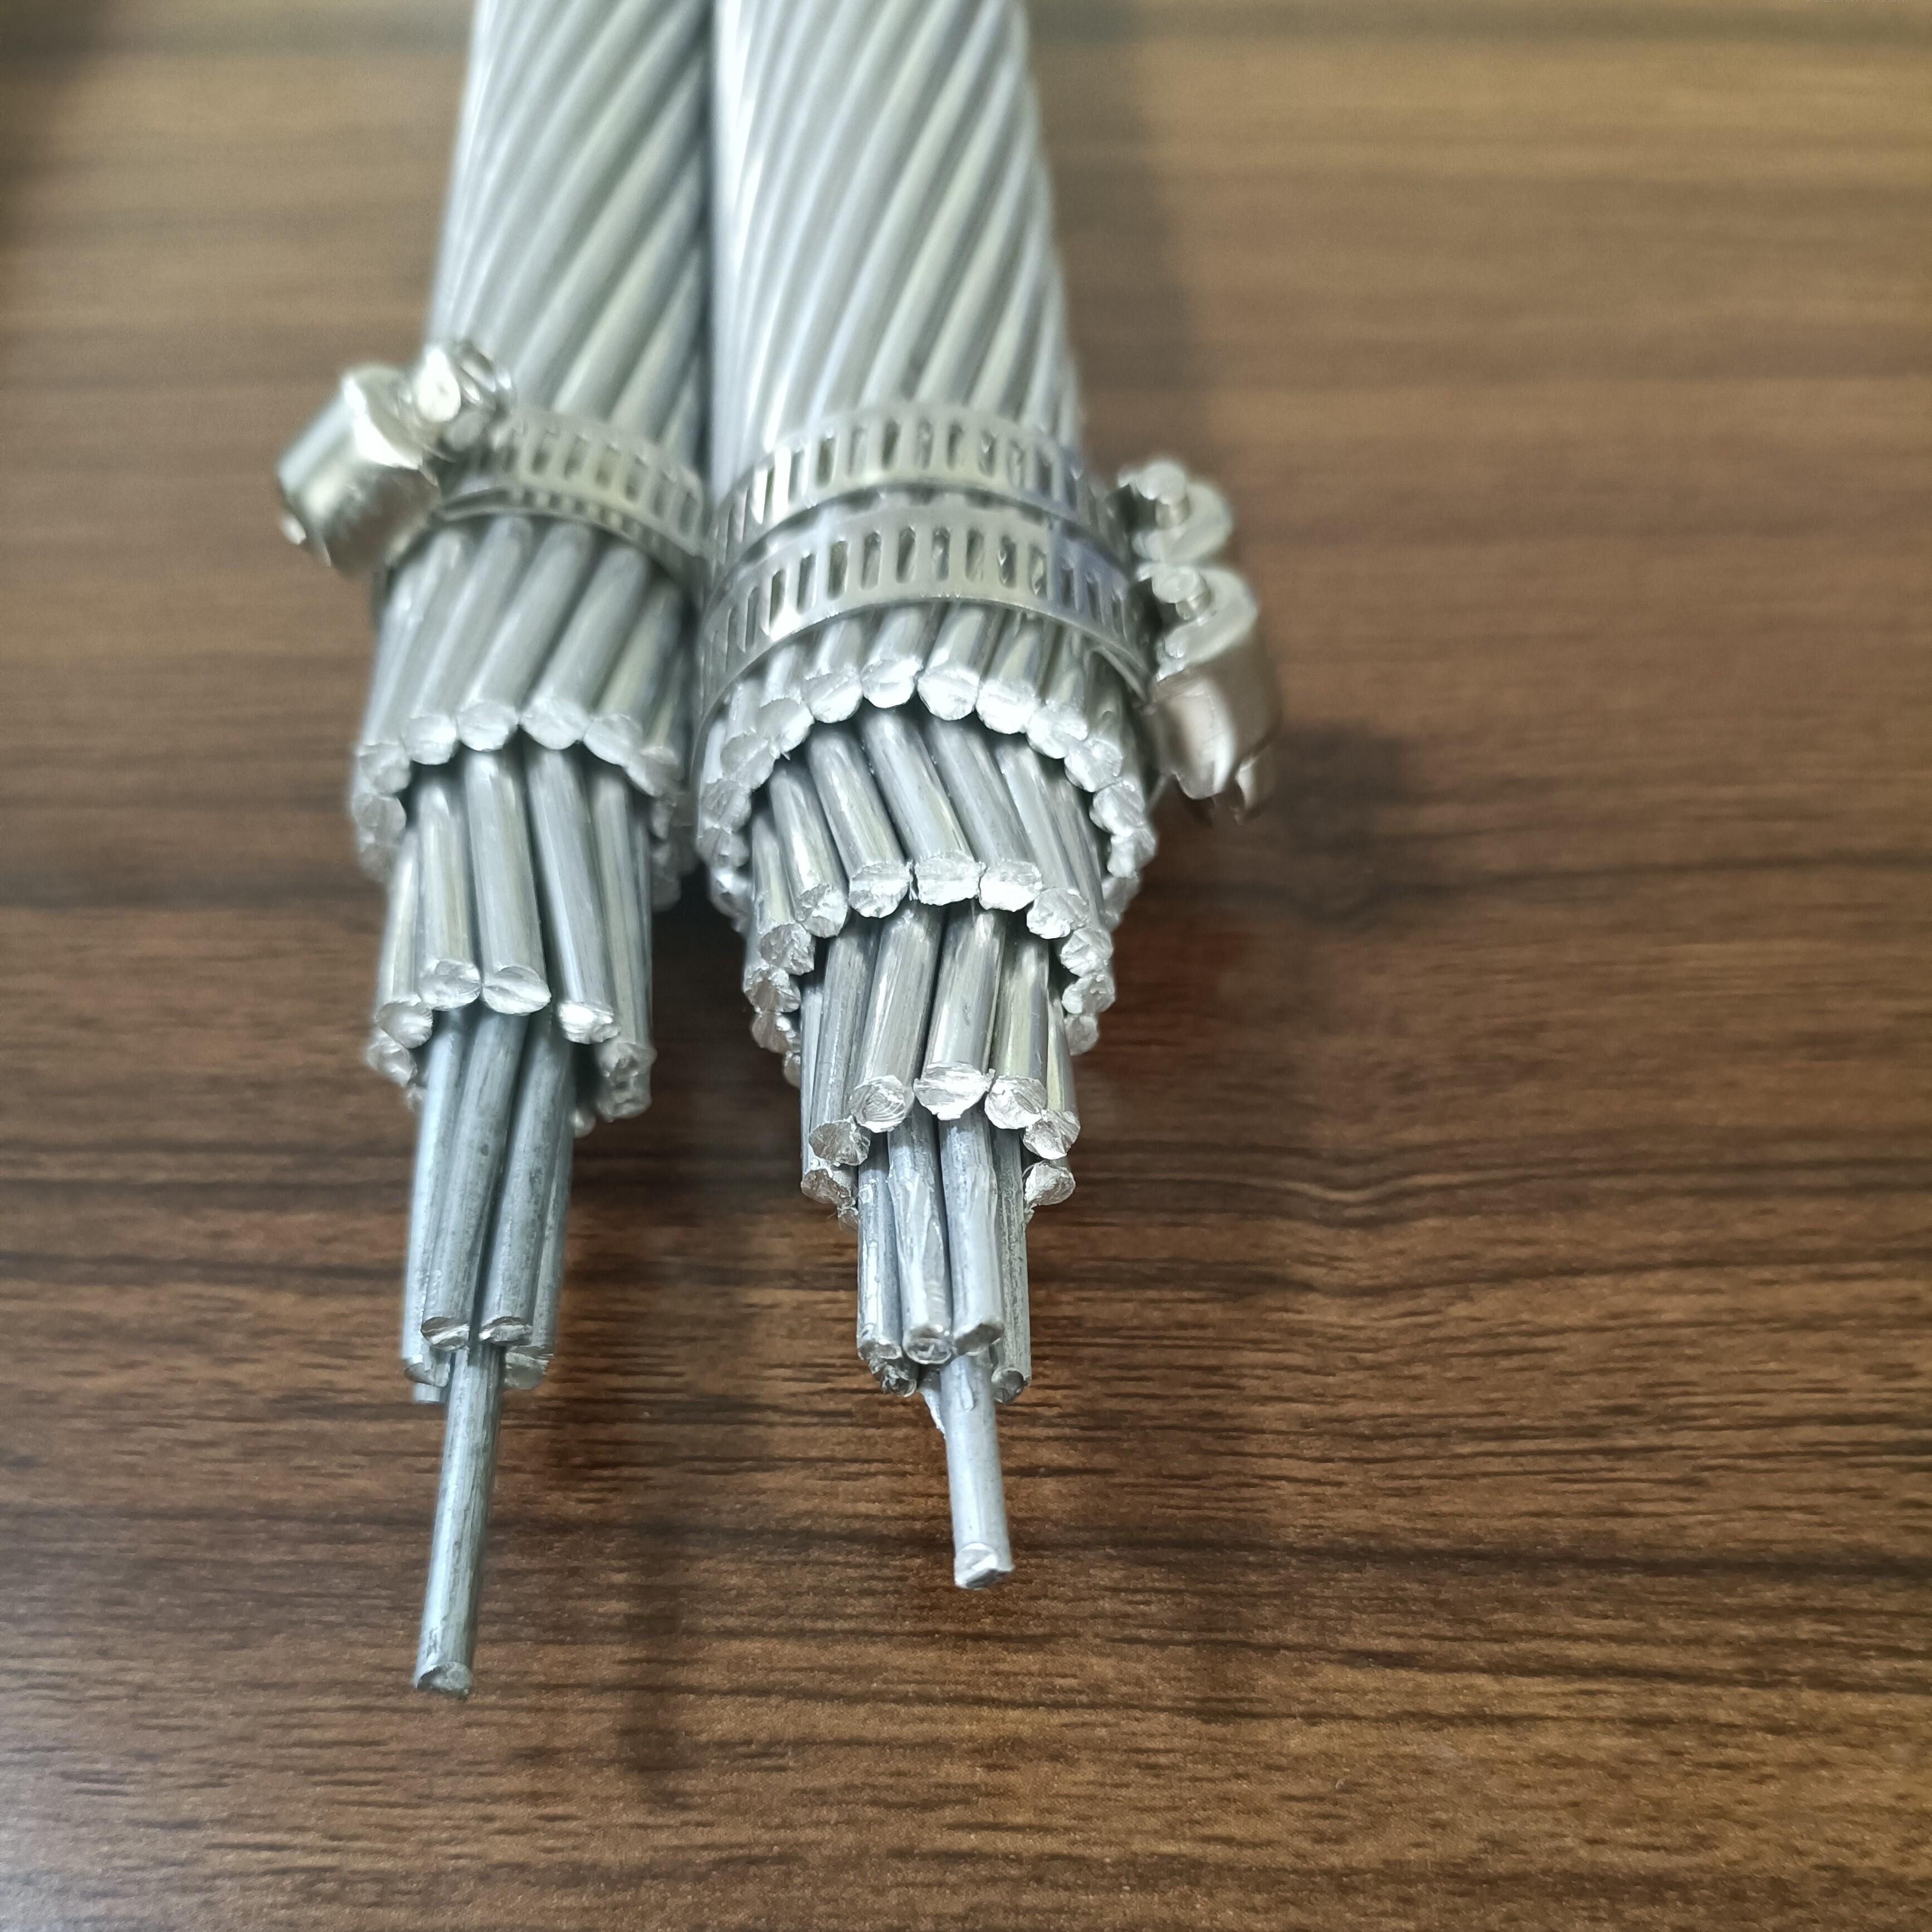 2xLGKK-900双分裂扩径耐热导线厂家直销